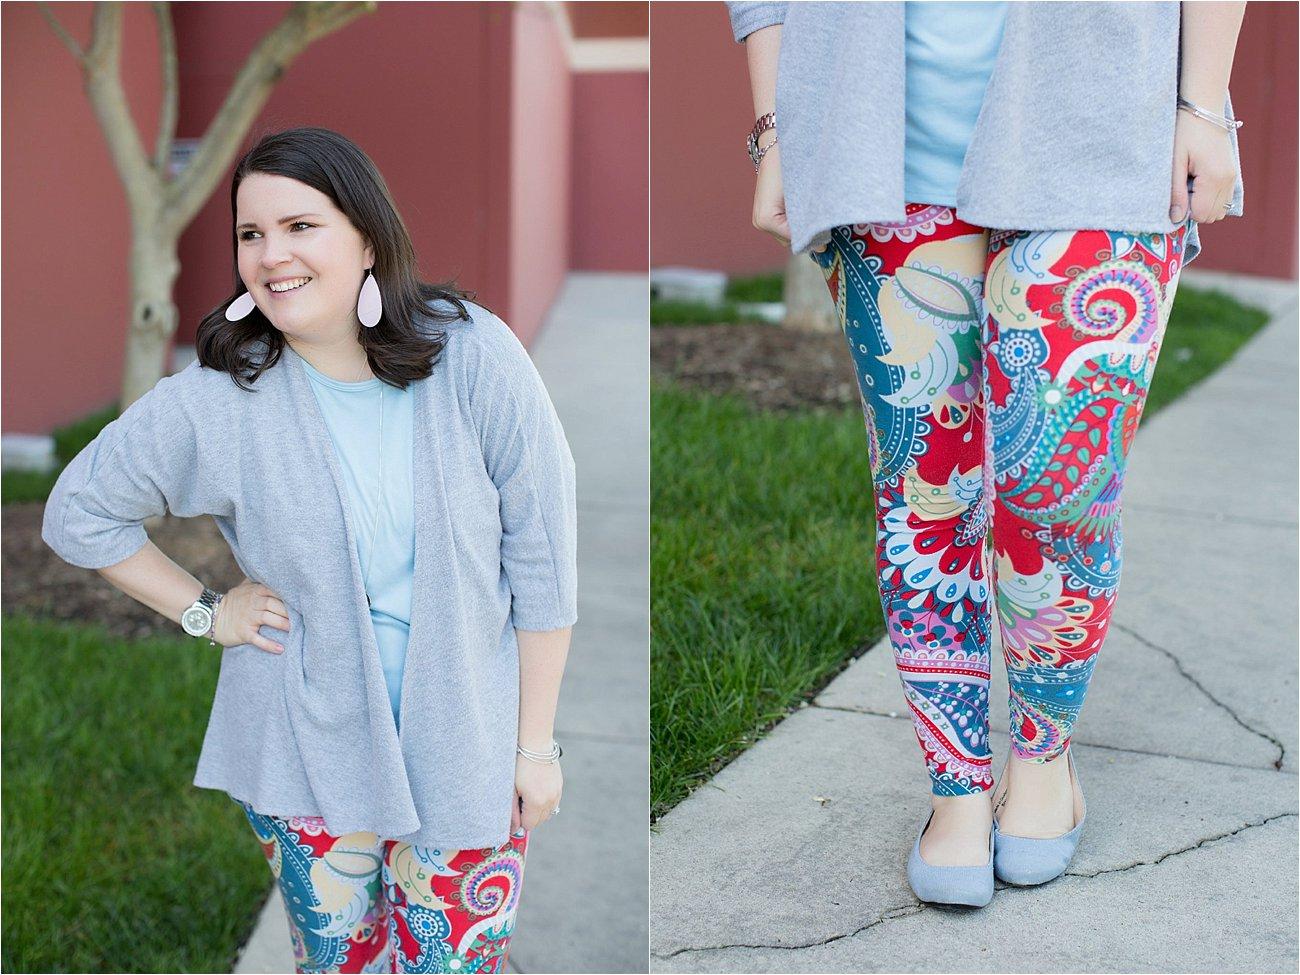 LulaRoe Lindsay Kimono in Grey, Lularoe Irma tunic, Paisley printed LulaRoe leggings, The Root Collective Gaby Ballet Flat, Nickel and Suede Earrings | Mom Style | North Carolina Fashion & Style Blogger (5)